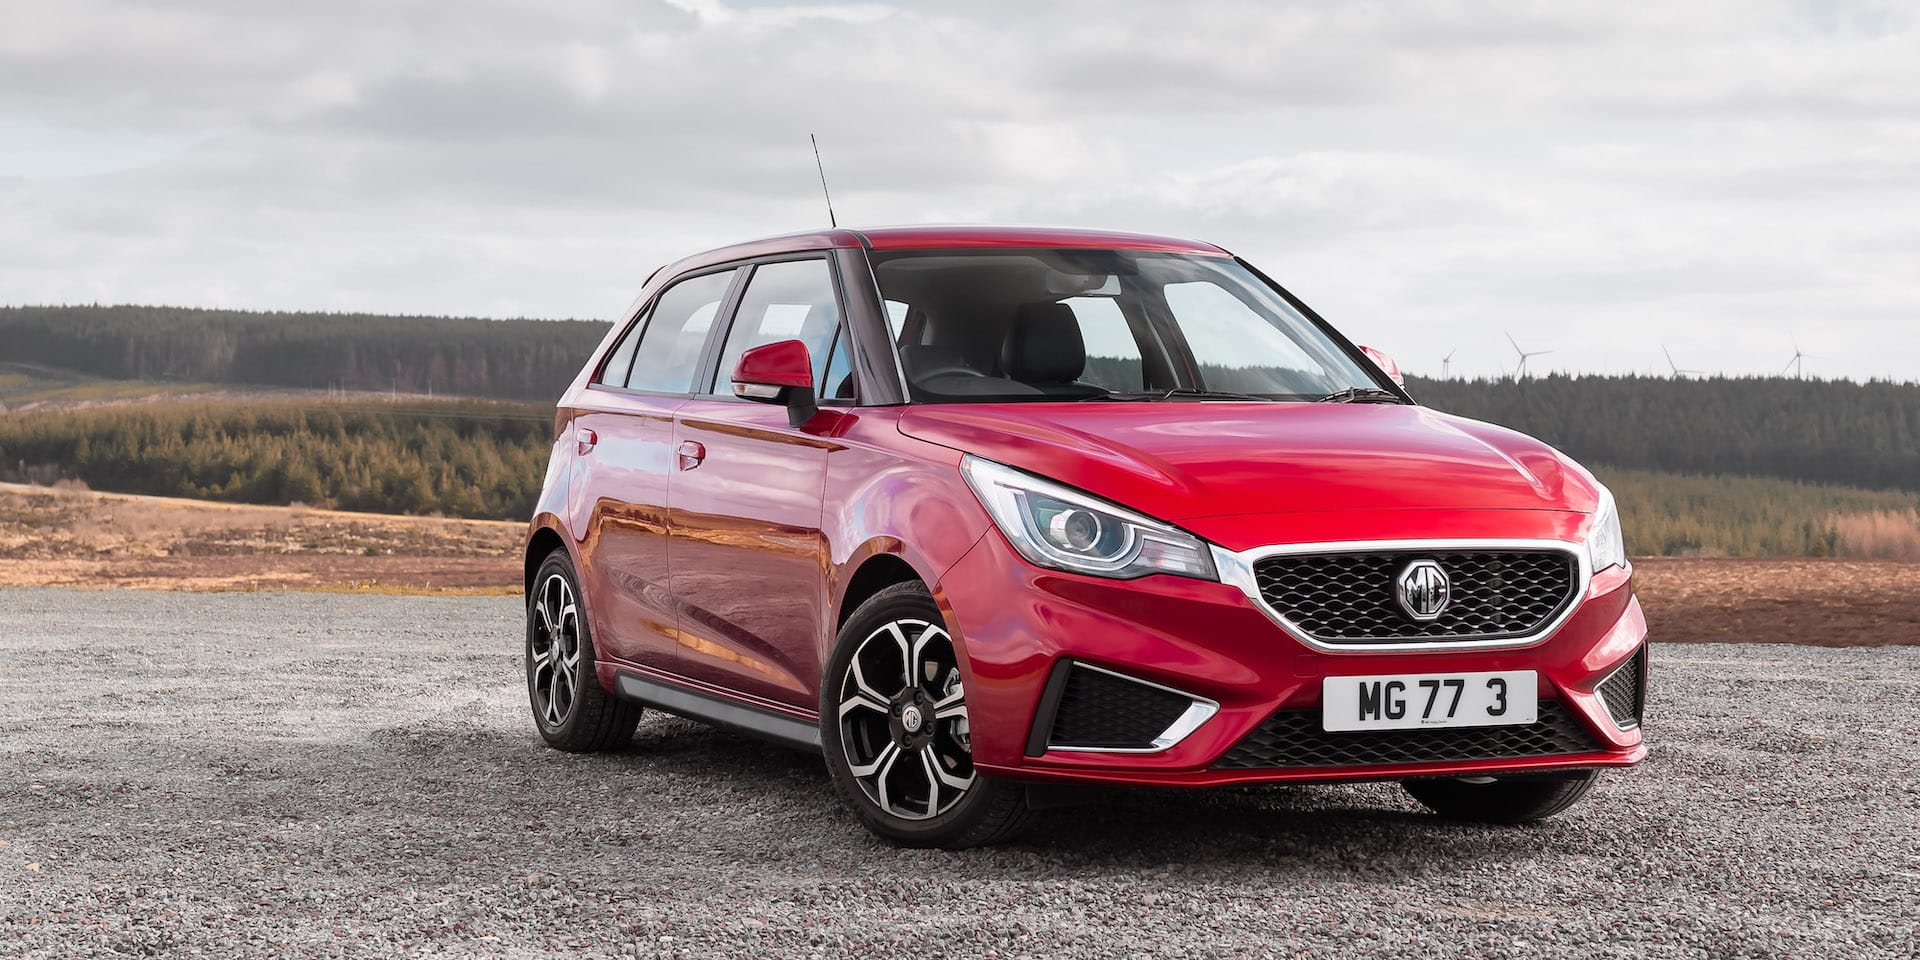 MG 3 (2019 facelift) – Expert Rating